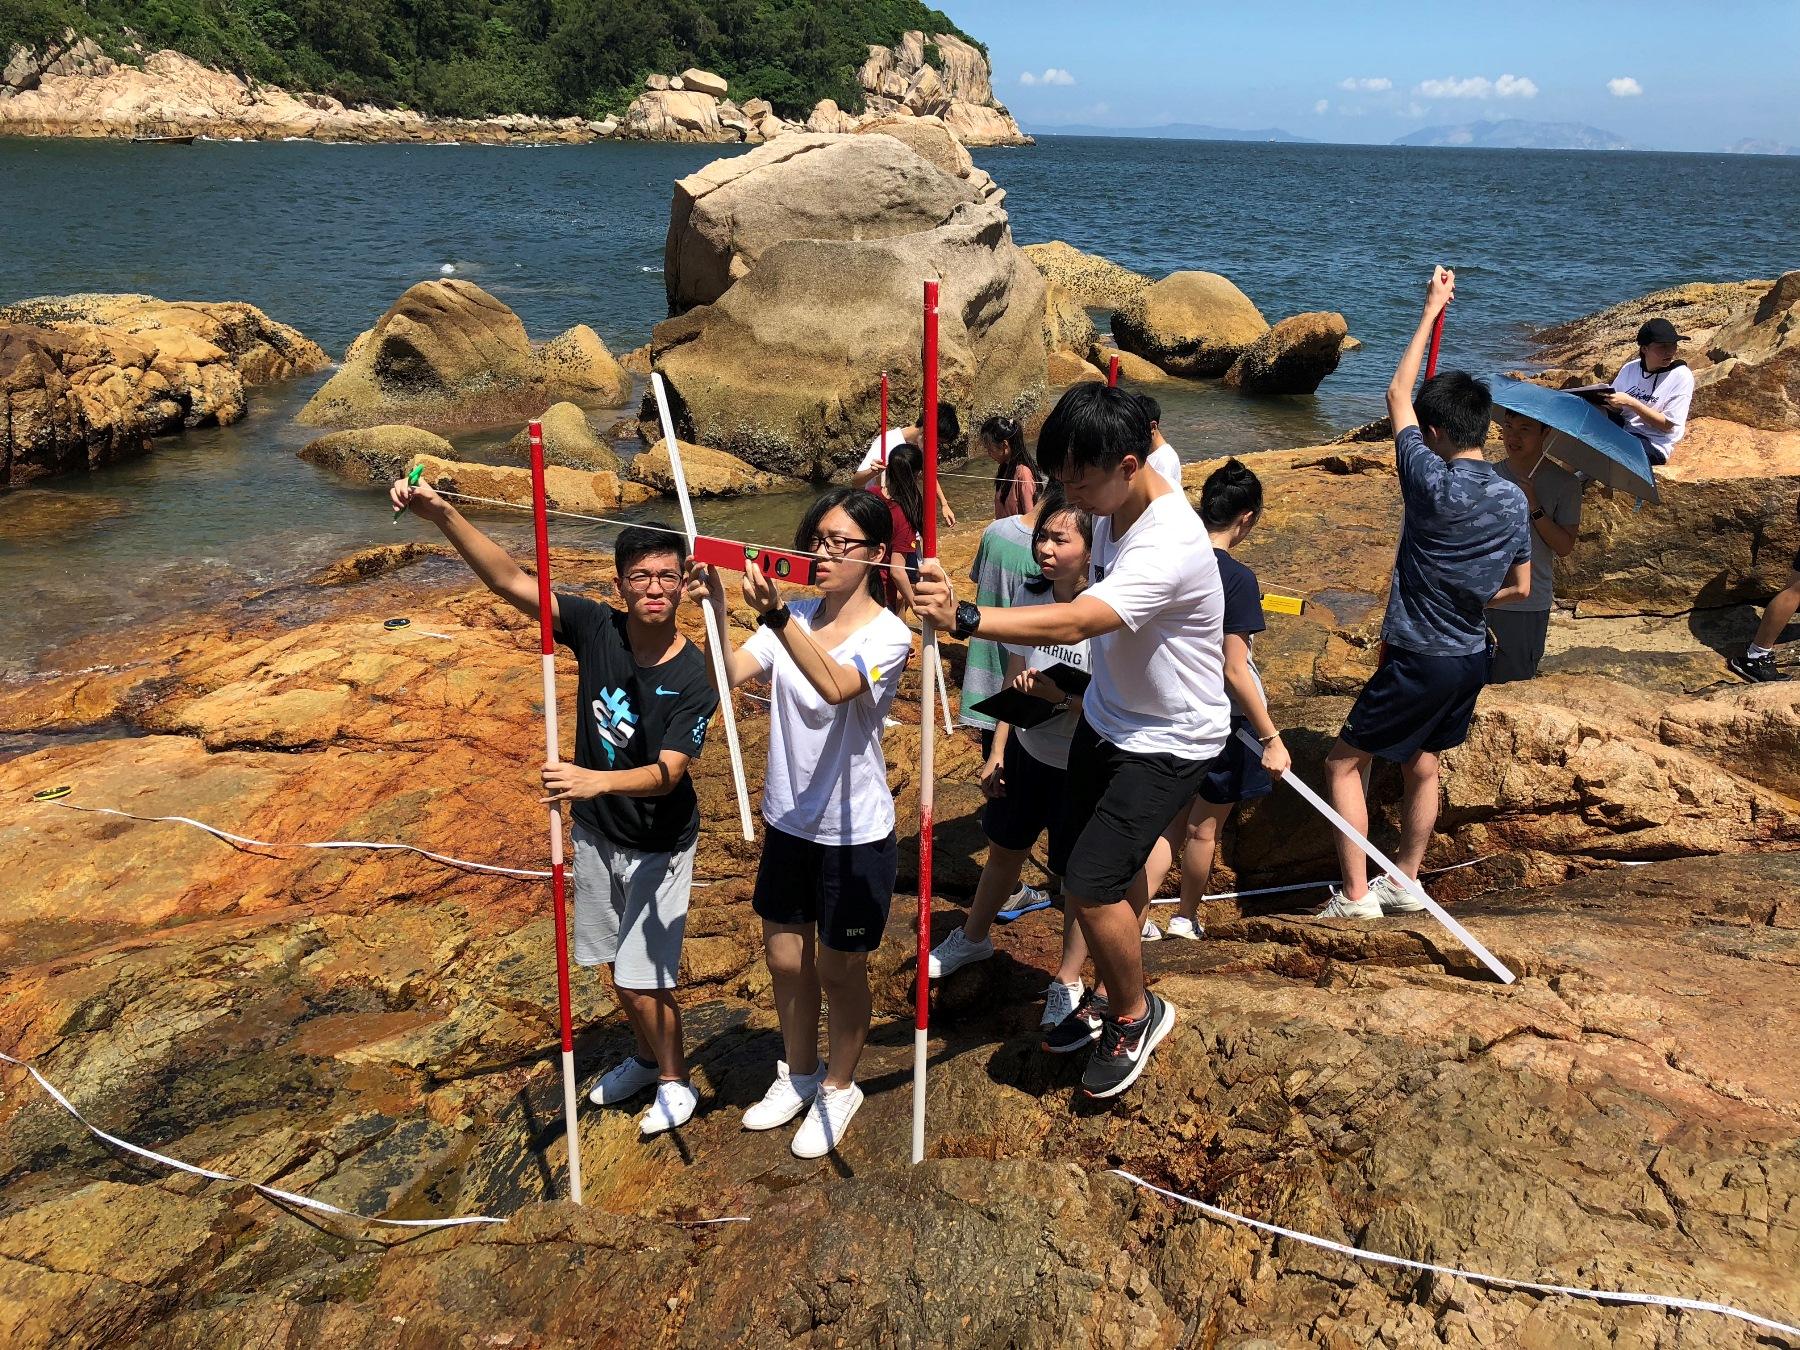 http://npc.edu.hk/sites/default/files/6_524.jpg